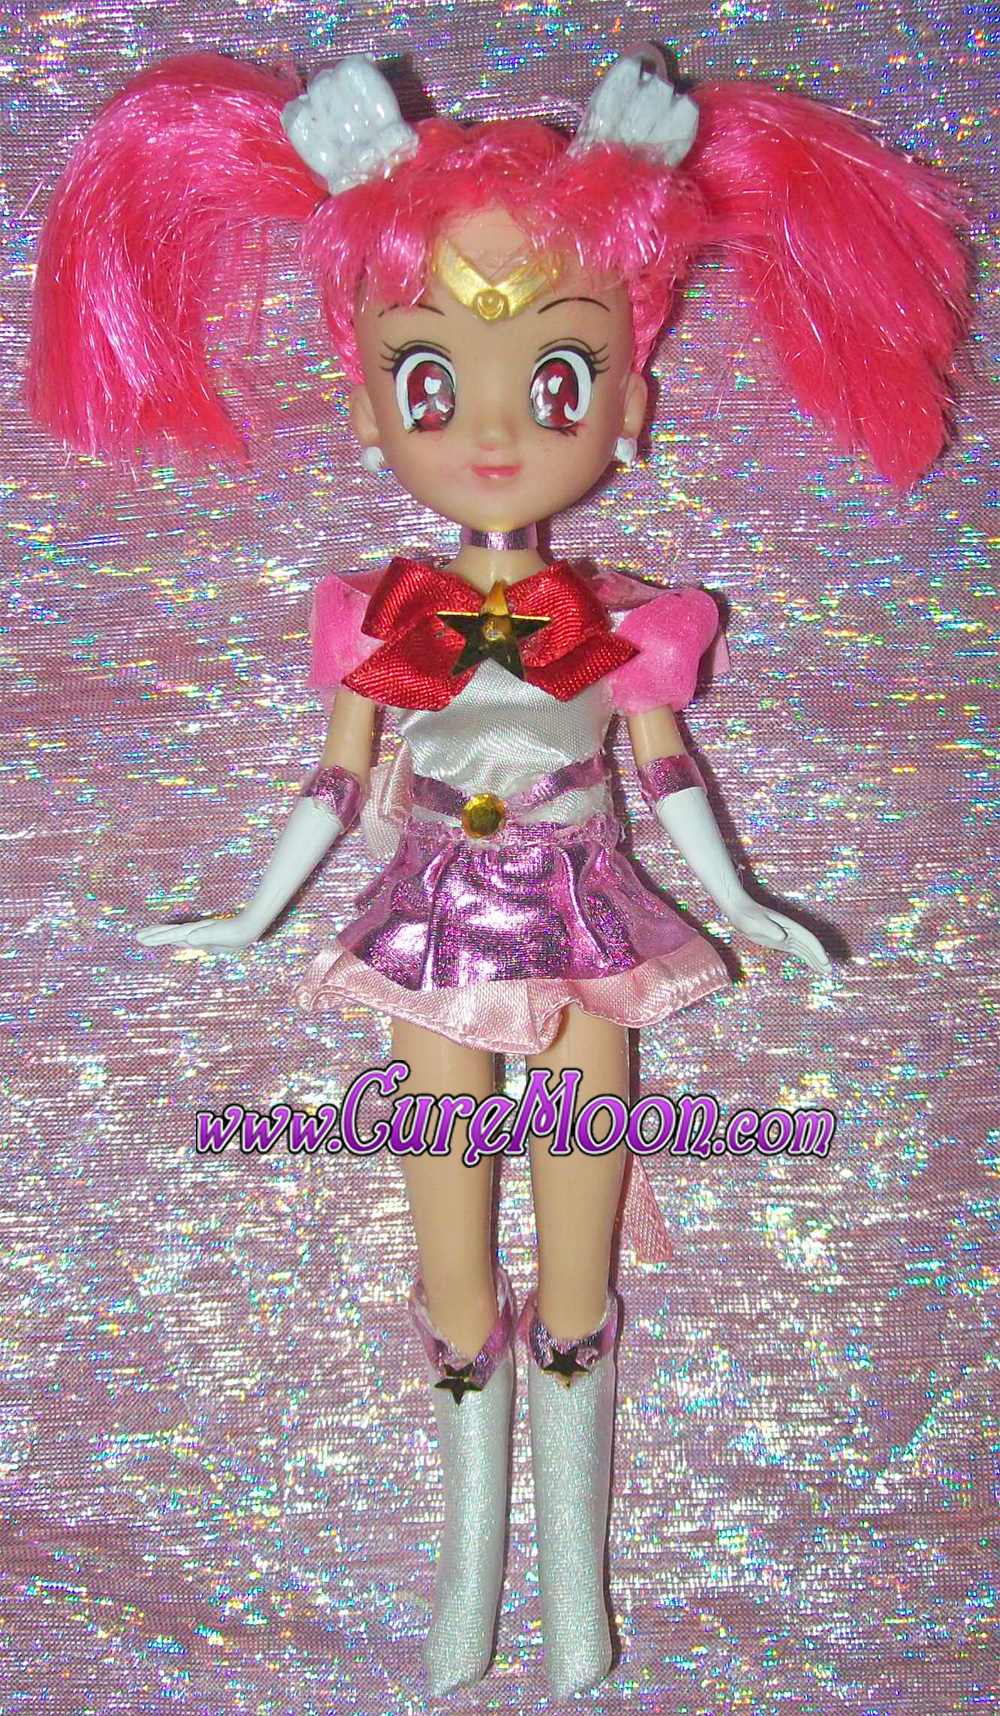 sailor-moon-stars-doll-bambola-sailor-chibiusa-chibimoon-2011-version-custom-ooak-giochi-preziosi-curemoon